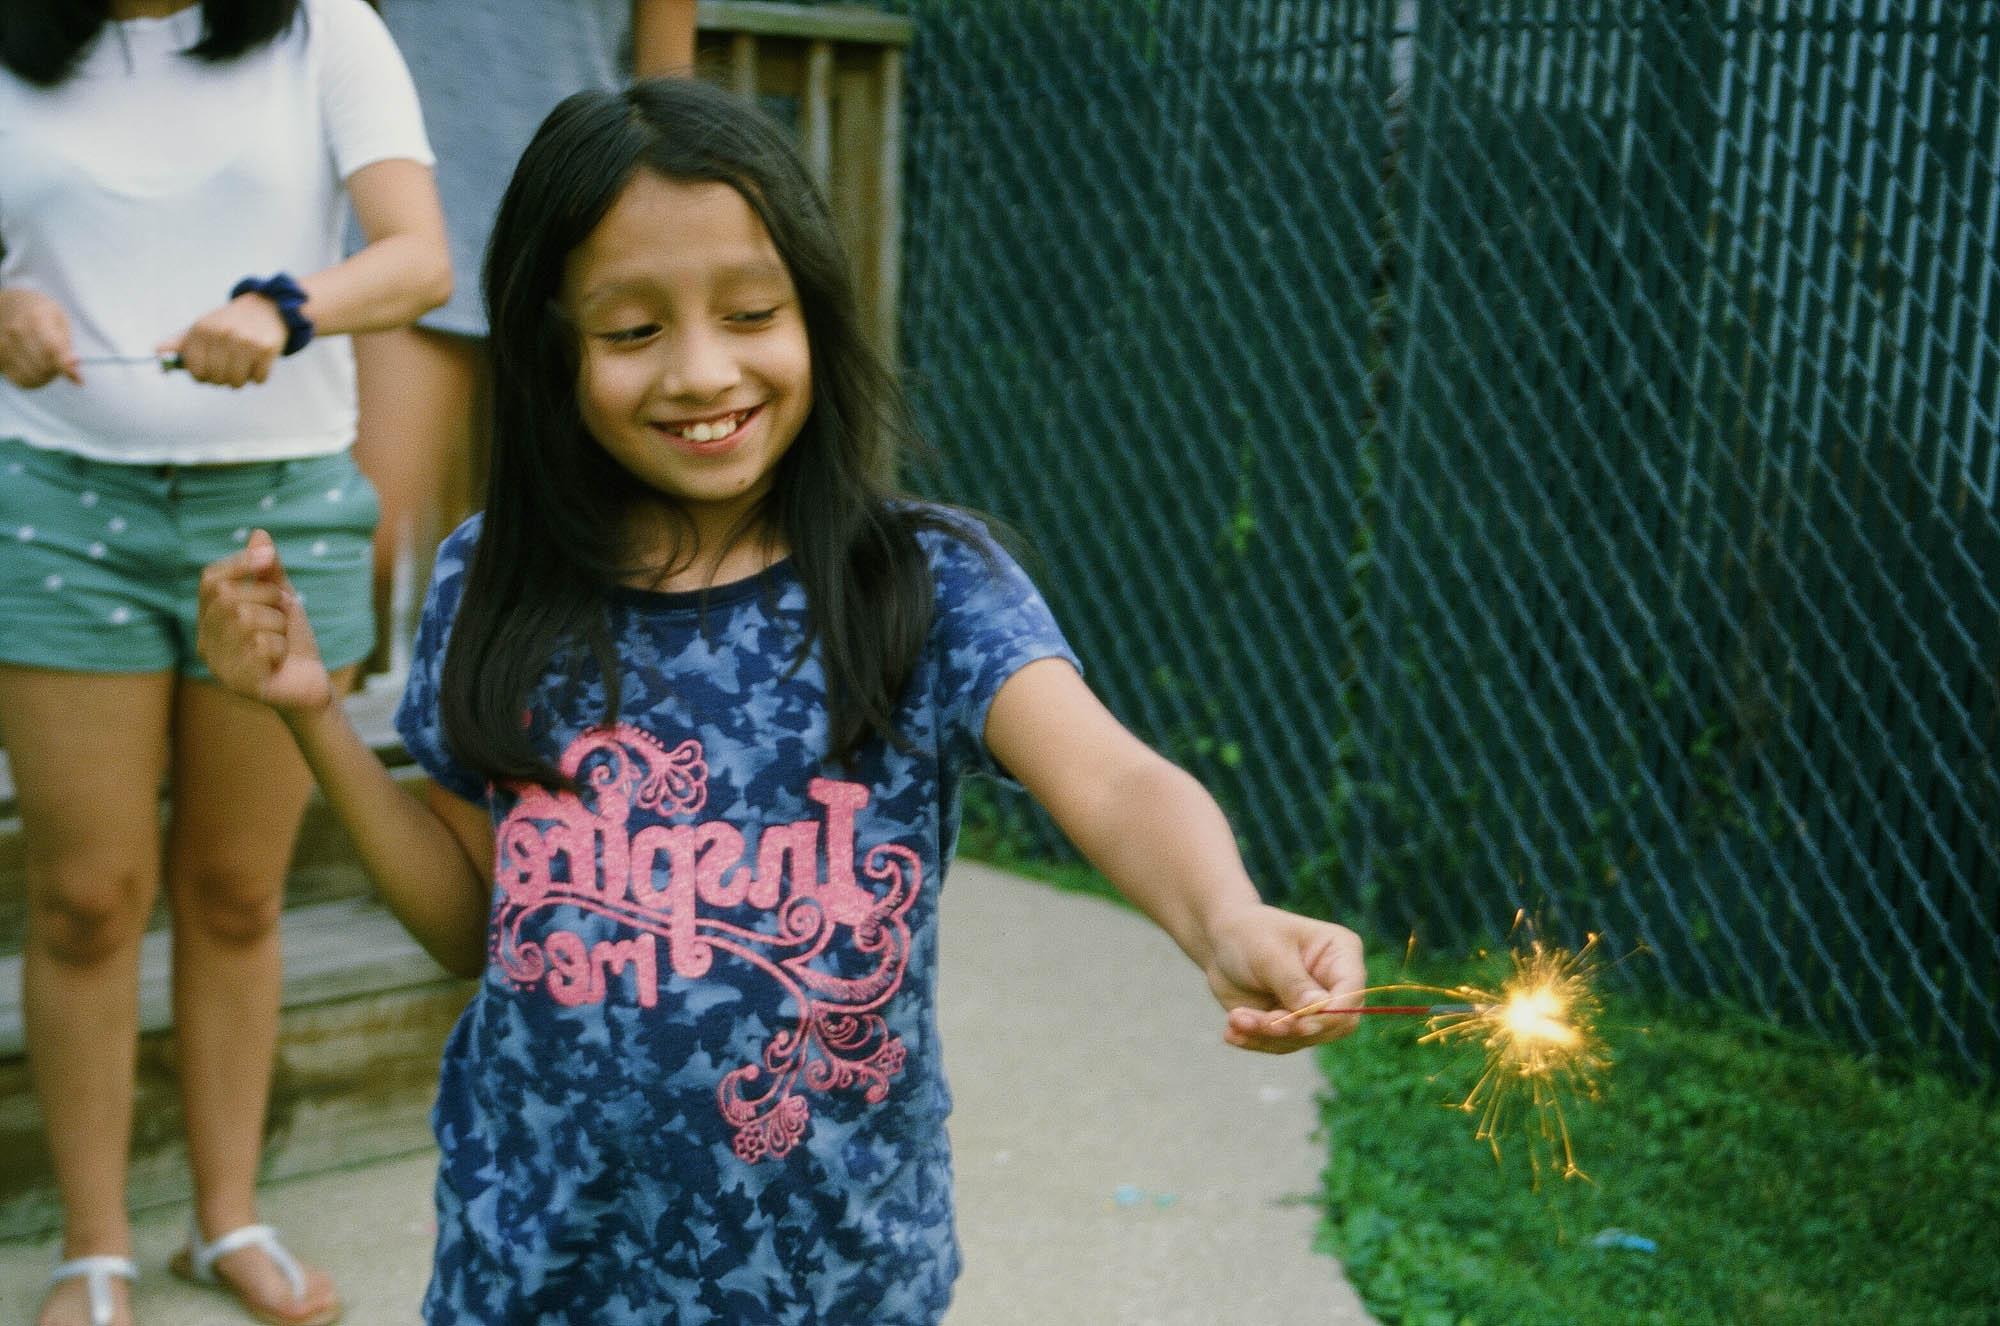 This is a 4th of July photo taken on the new Kodak Ektachrome 100.